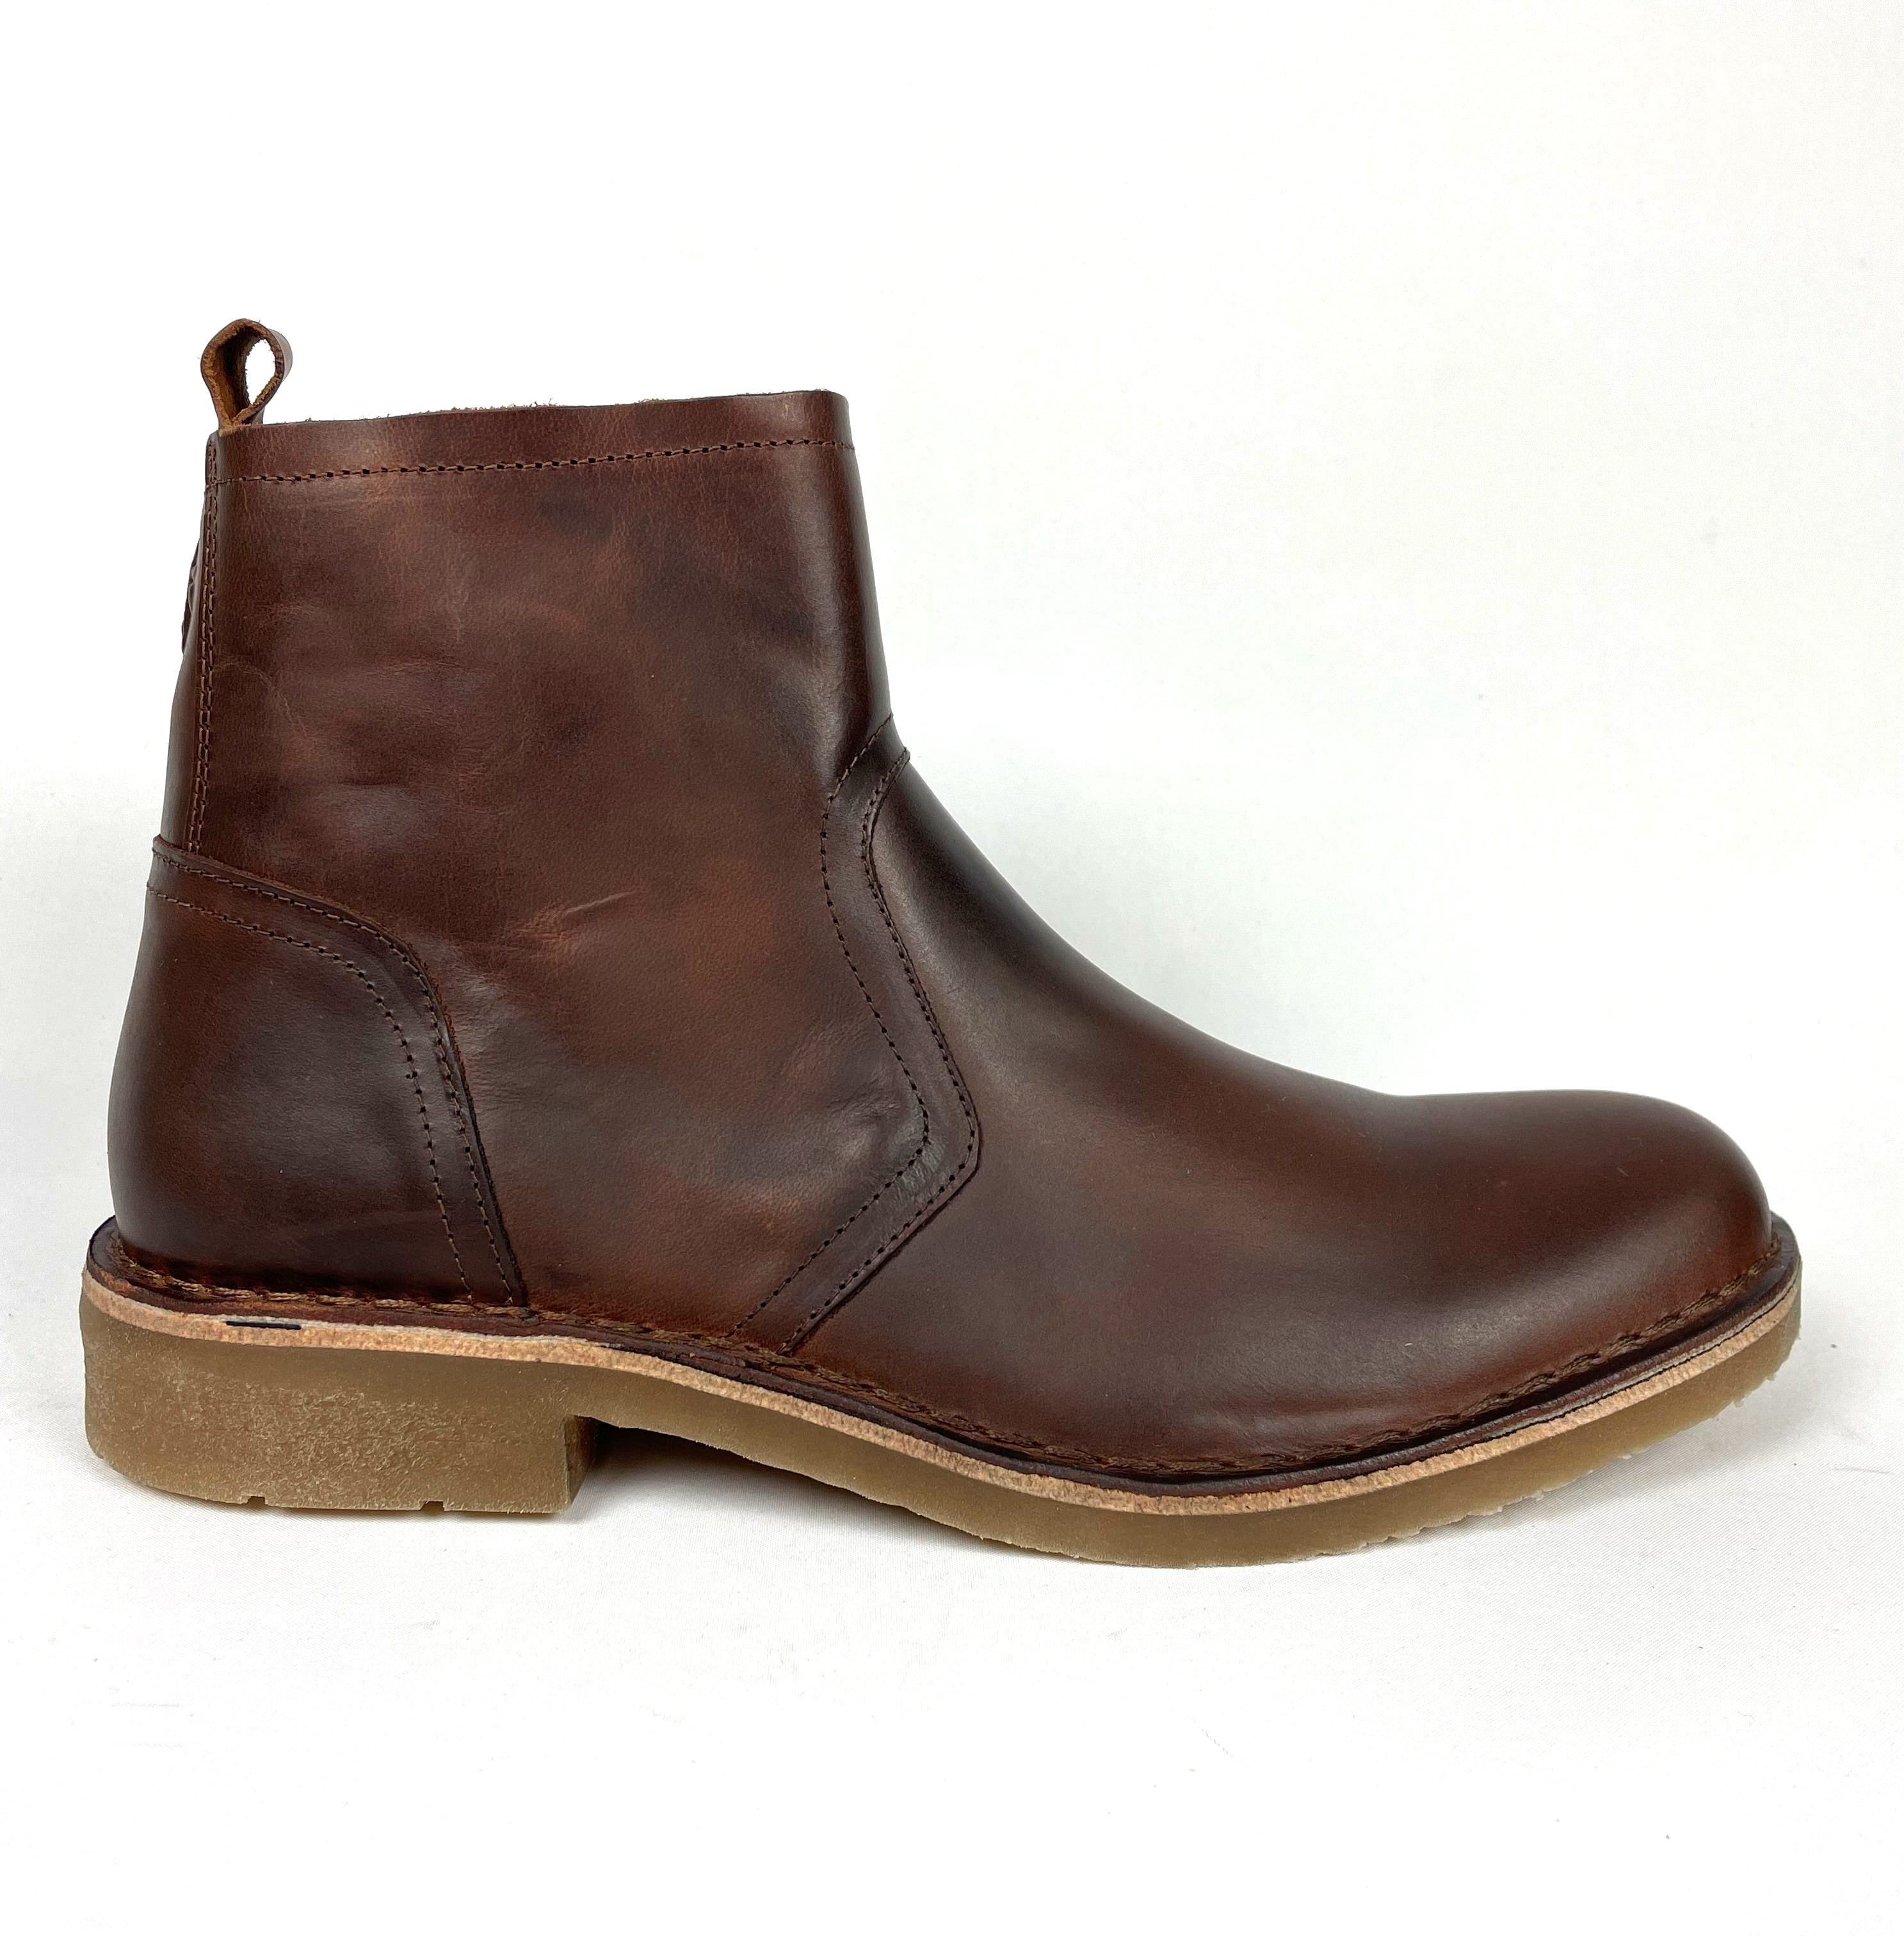 Fly London Riky Boot - Brandy